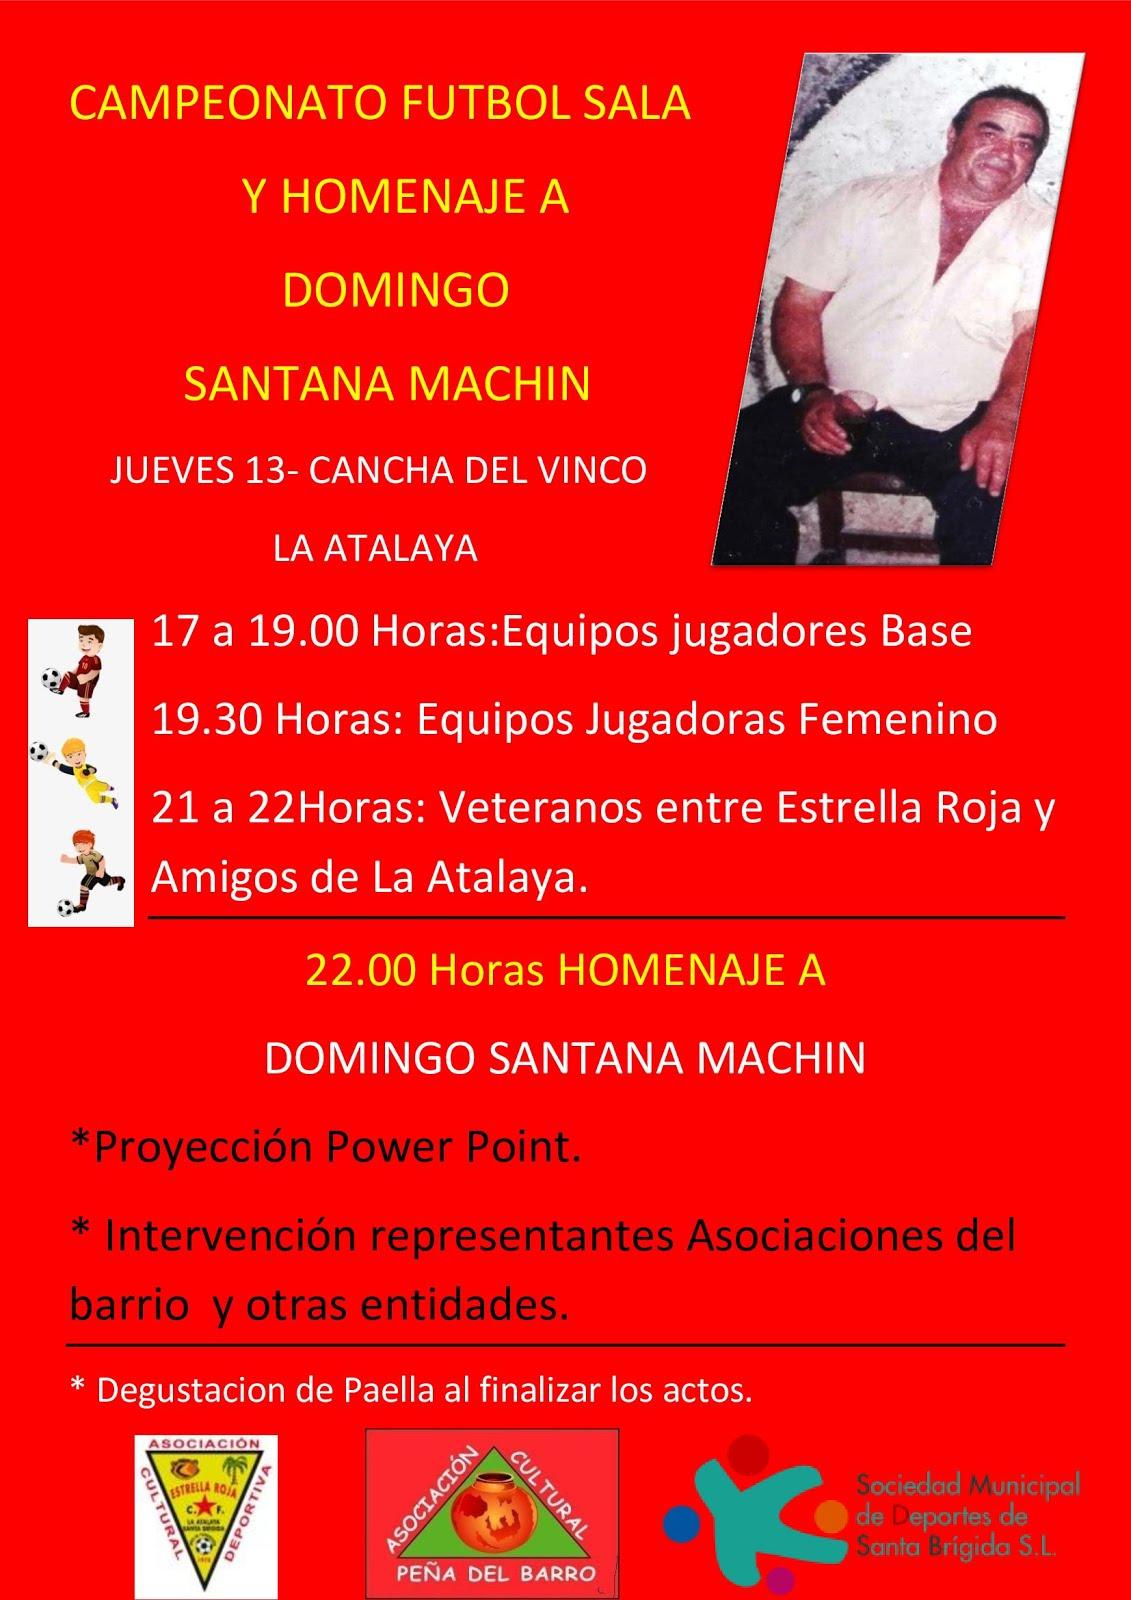 Futbol sala y Homenaje a Domingo Santana Machin